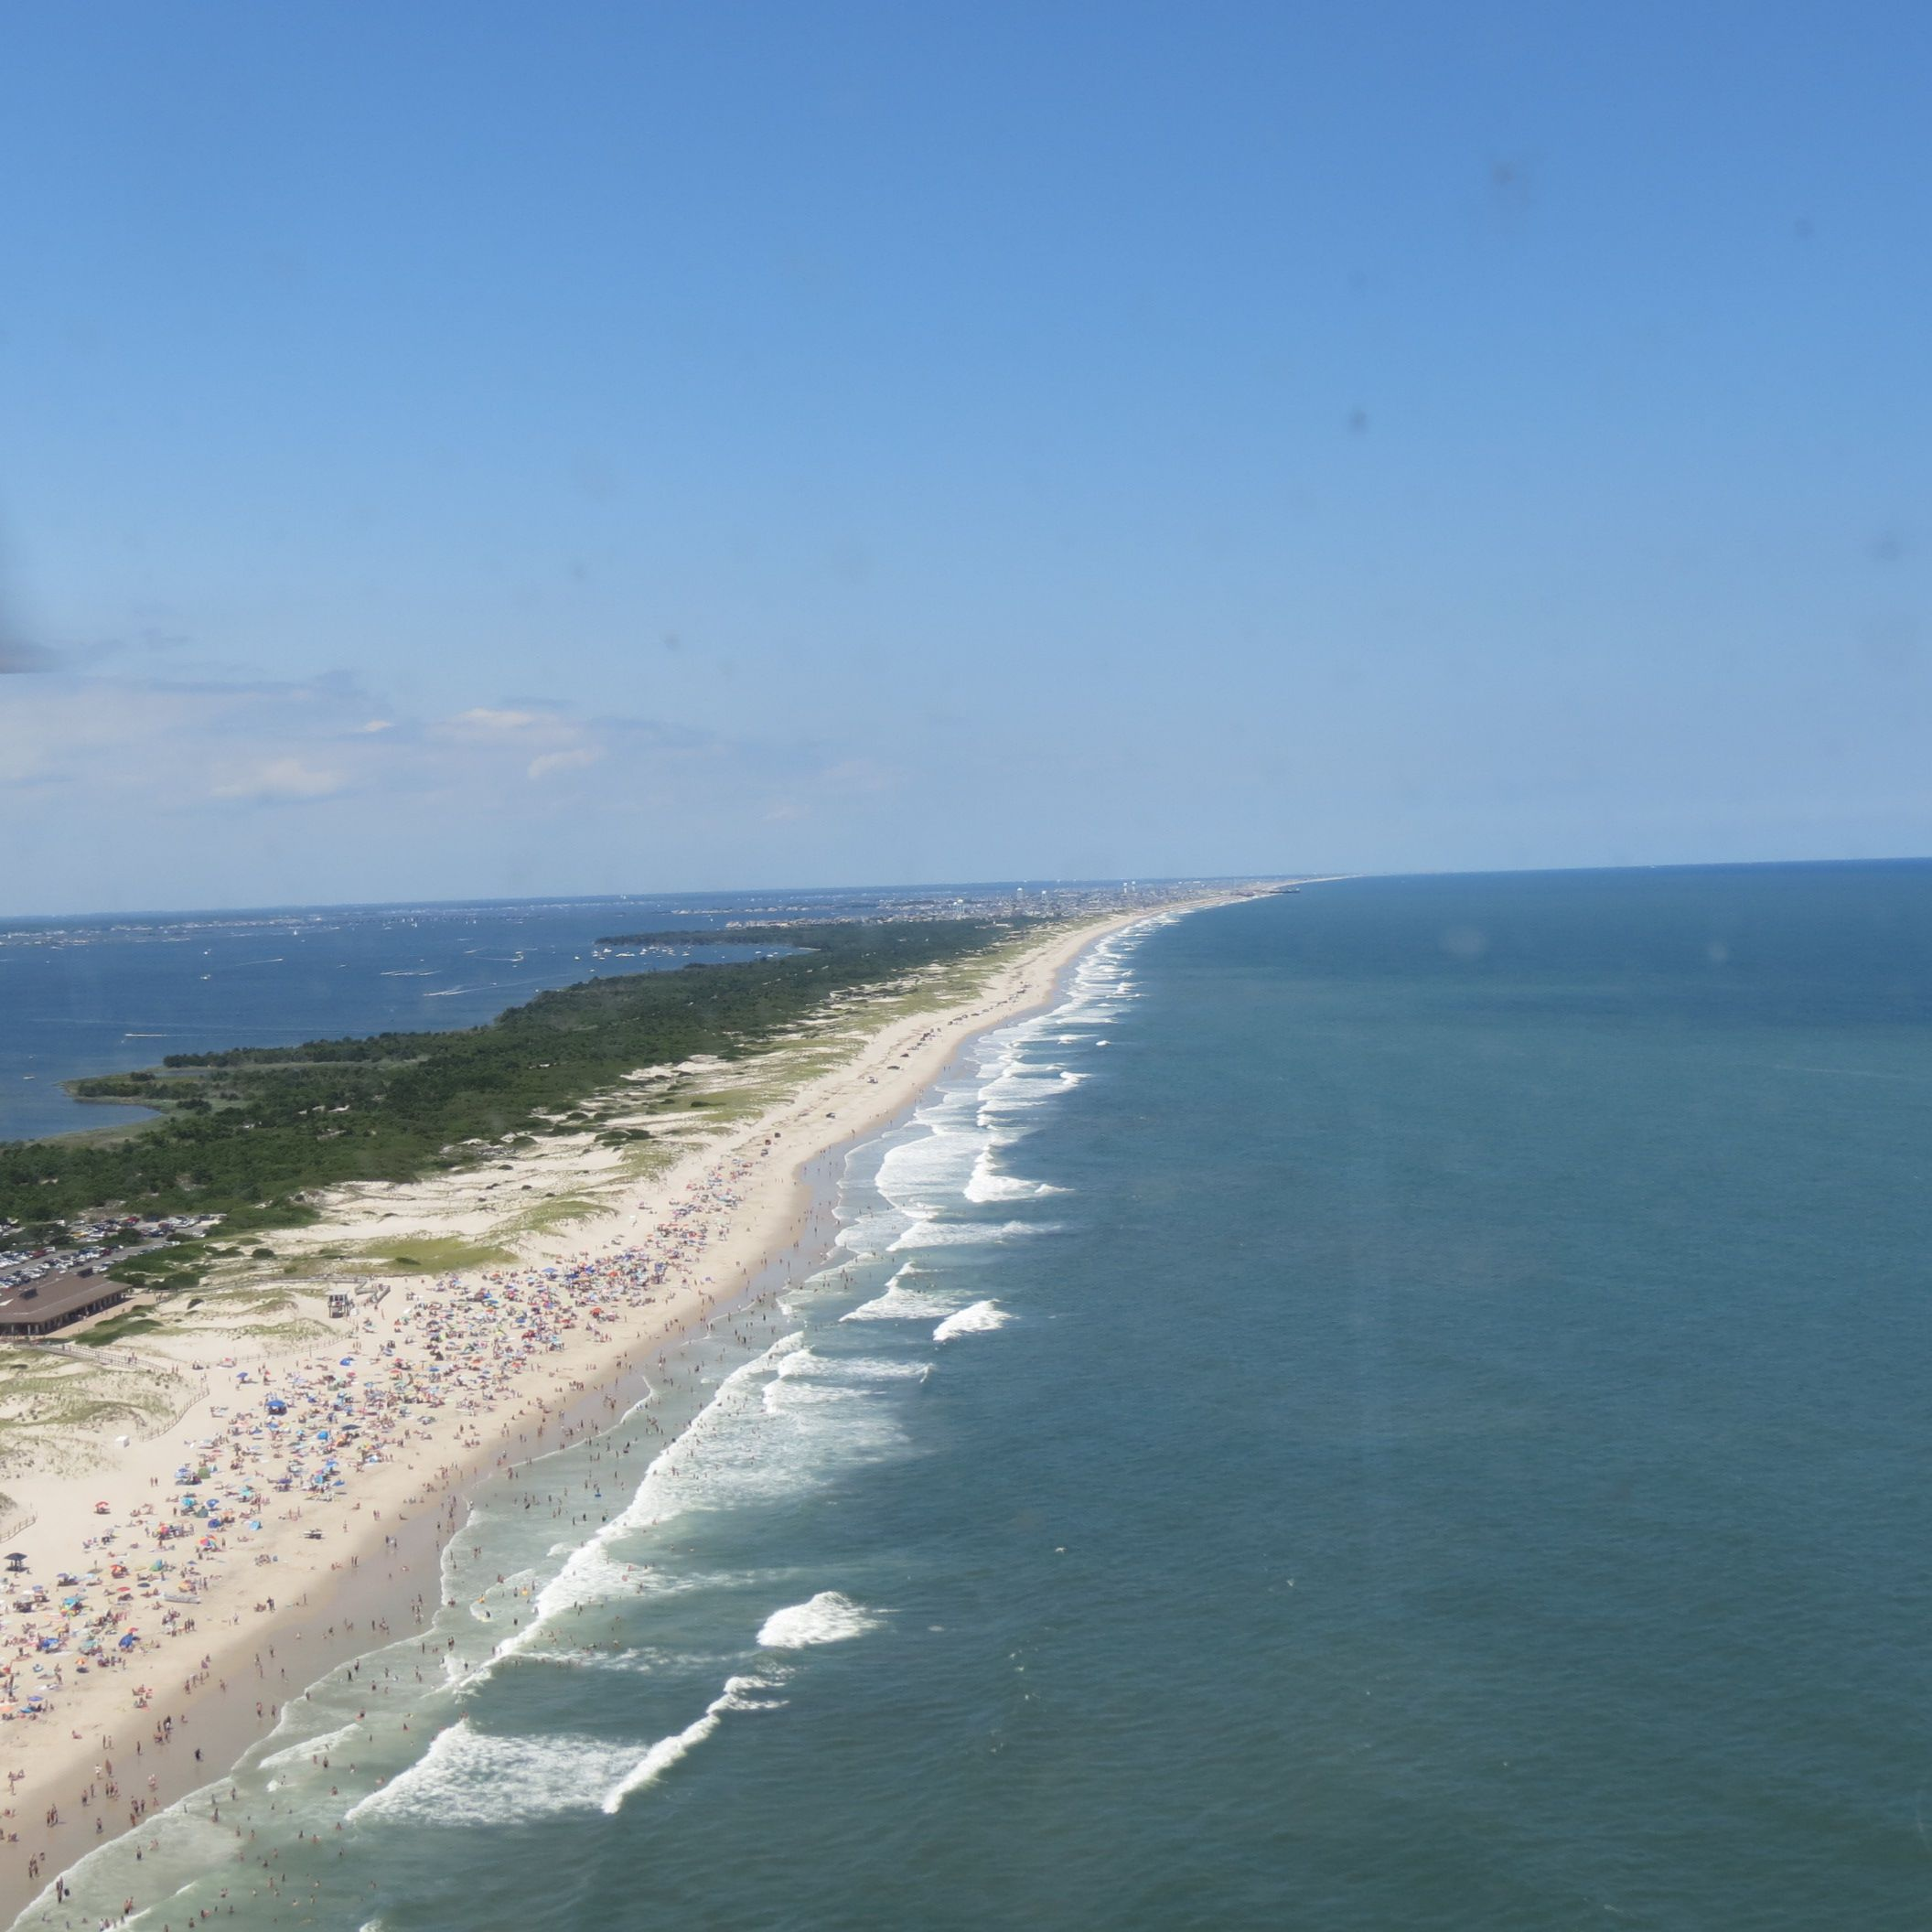 Beach Island: Island Beach State Park, Nj